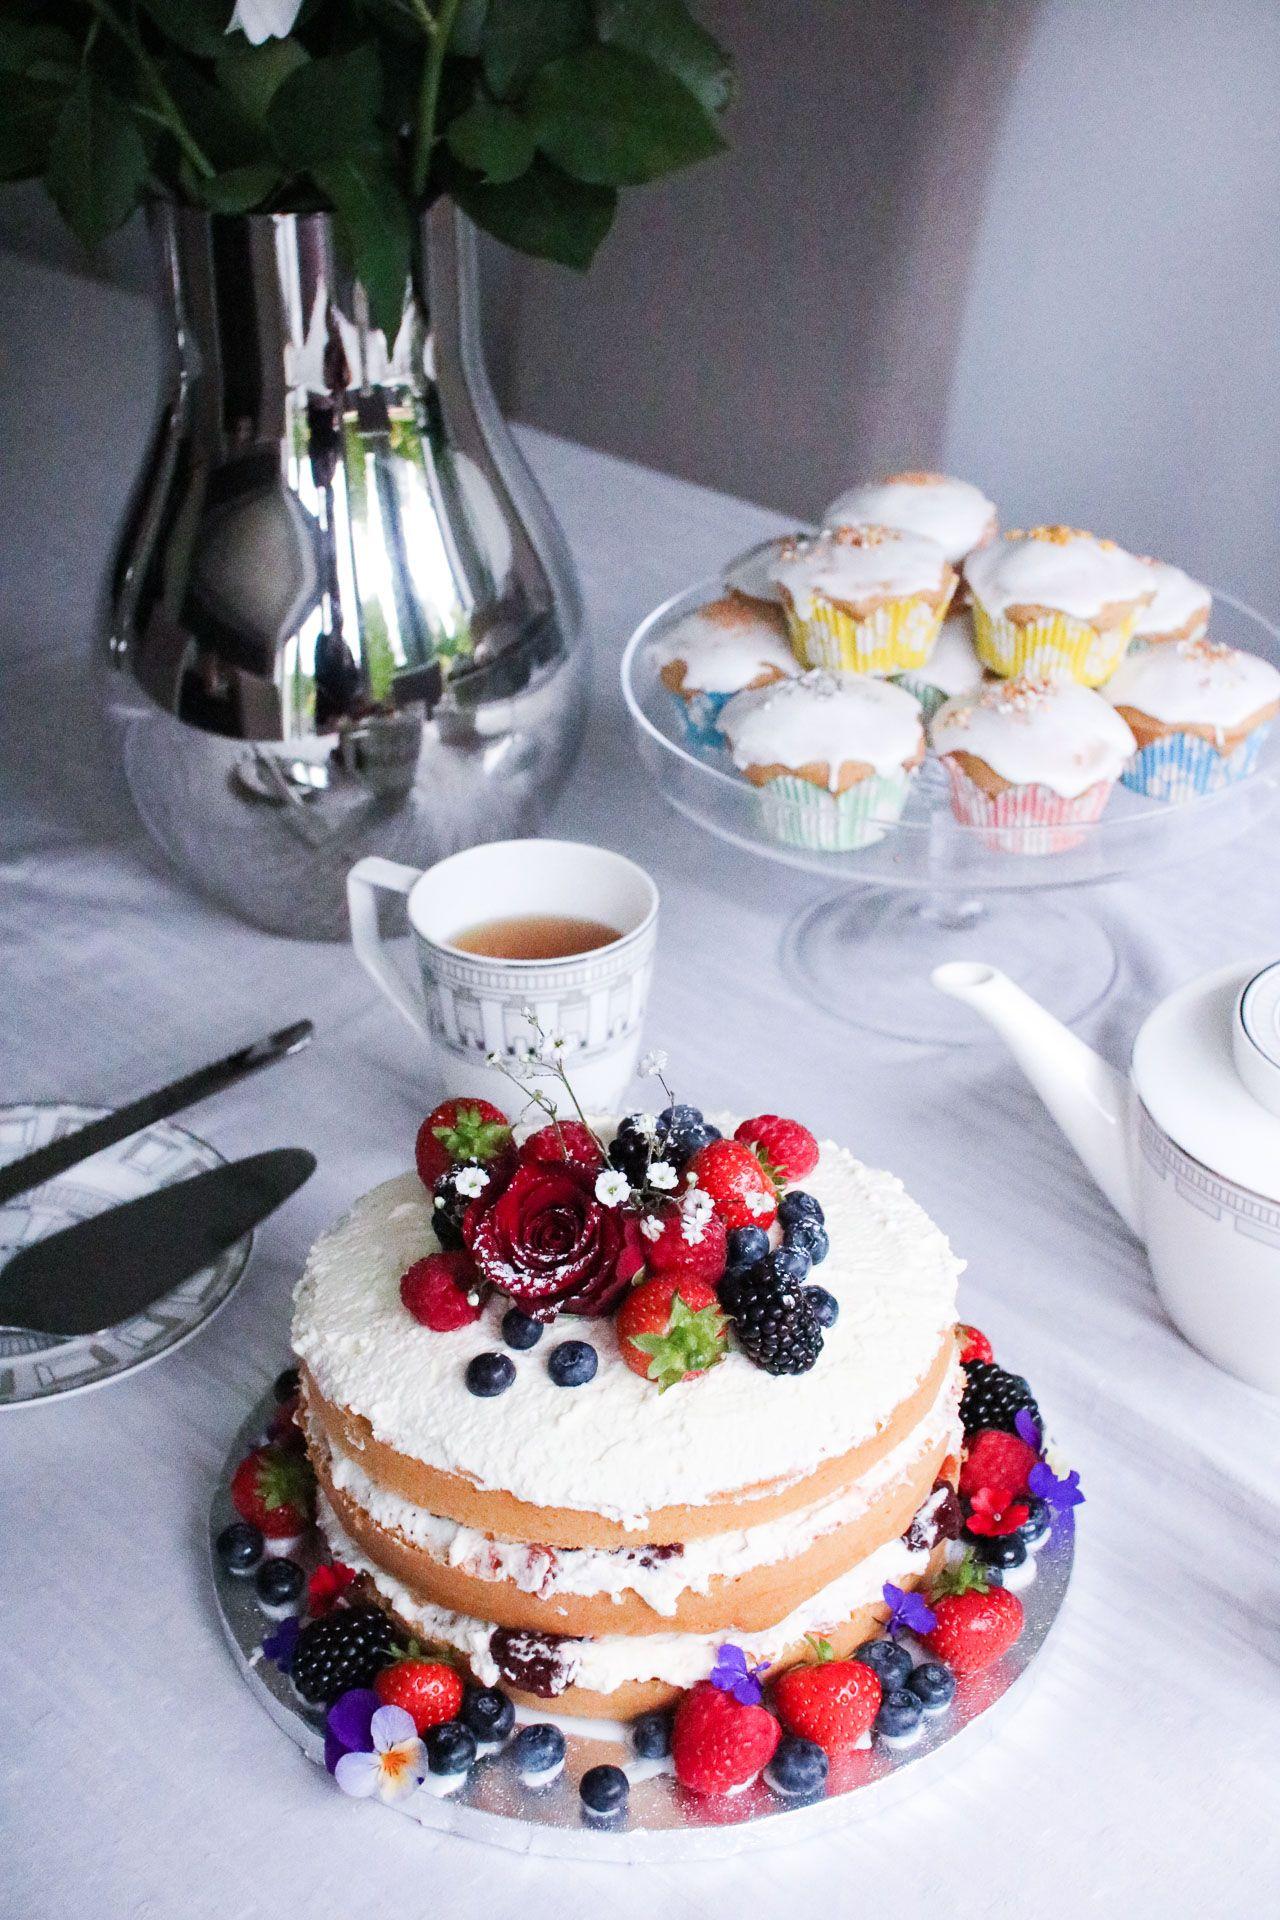 Rustic Victoria Sponge Cake Recipe Perfect As A Birthday Cake